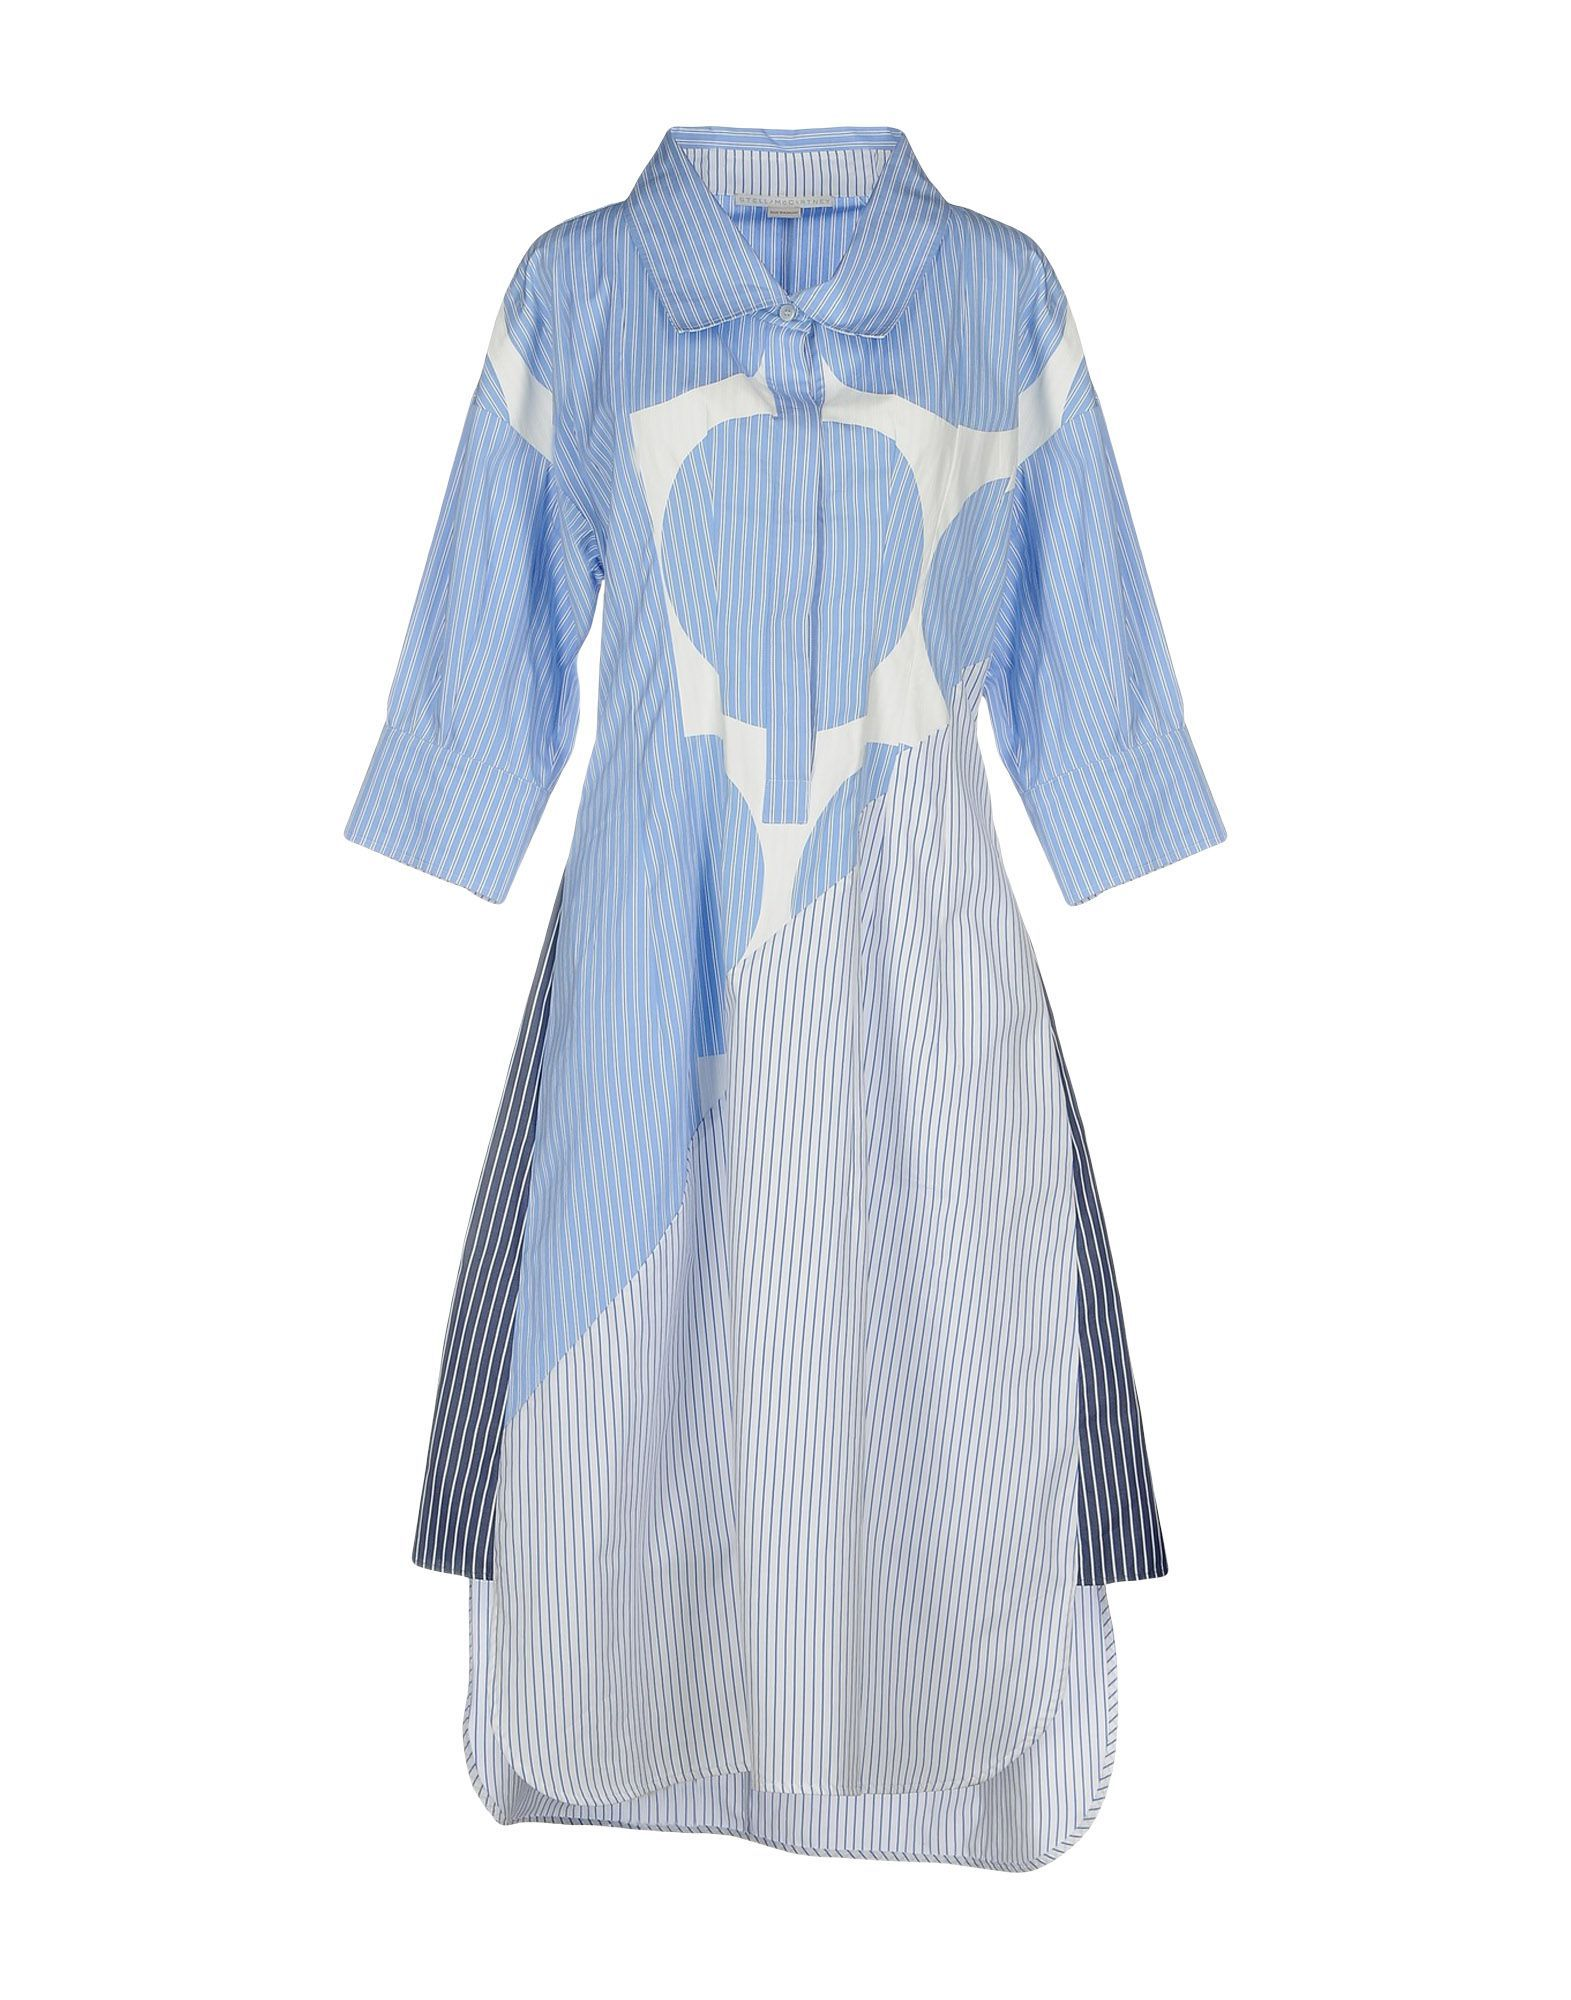 Stella McCartney Pastel Blue Print Cotton Shirt Dress